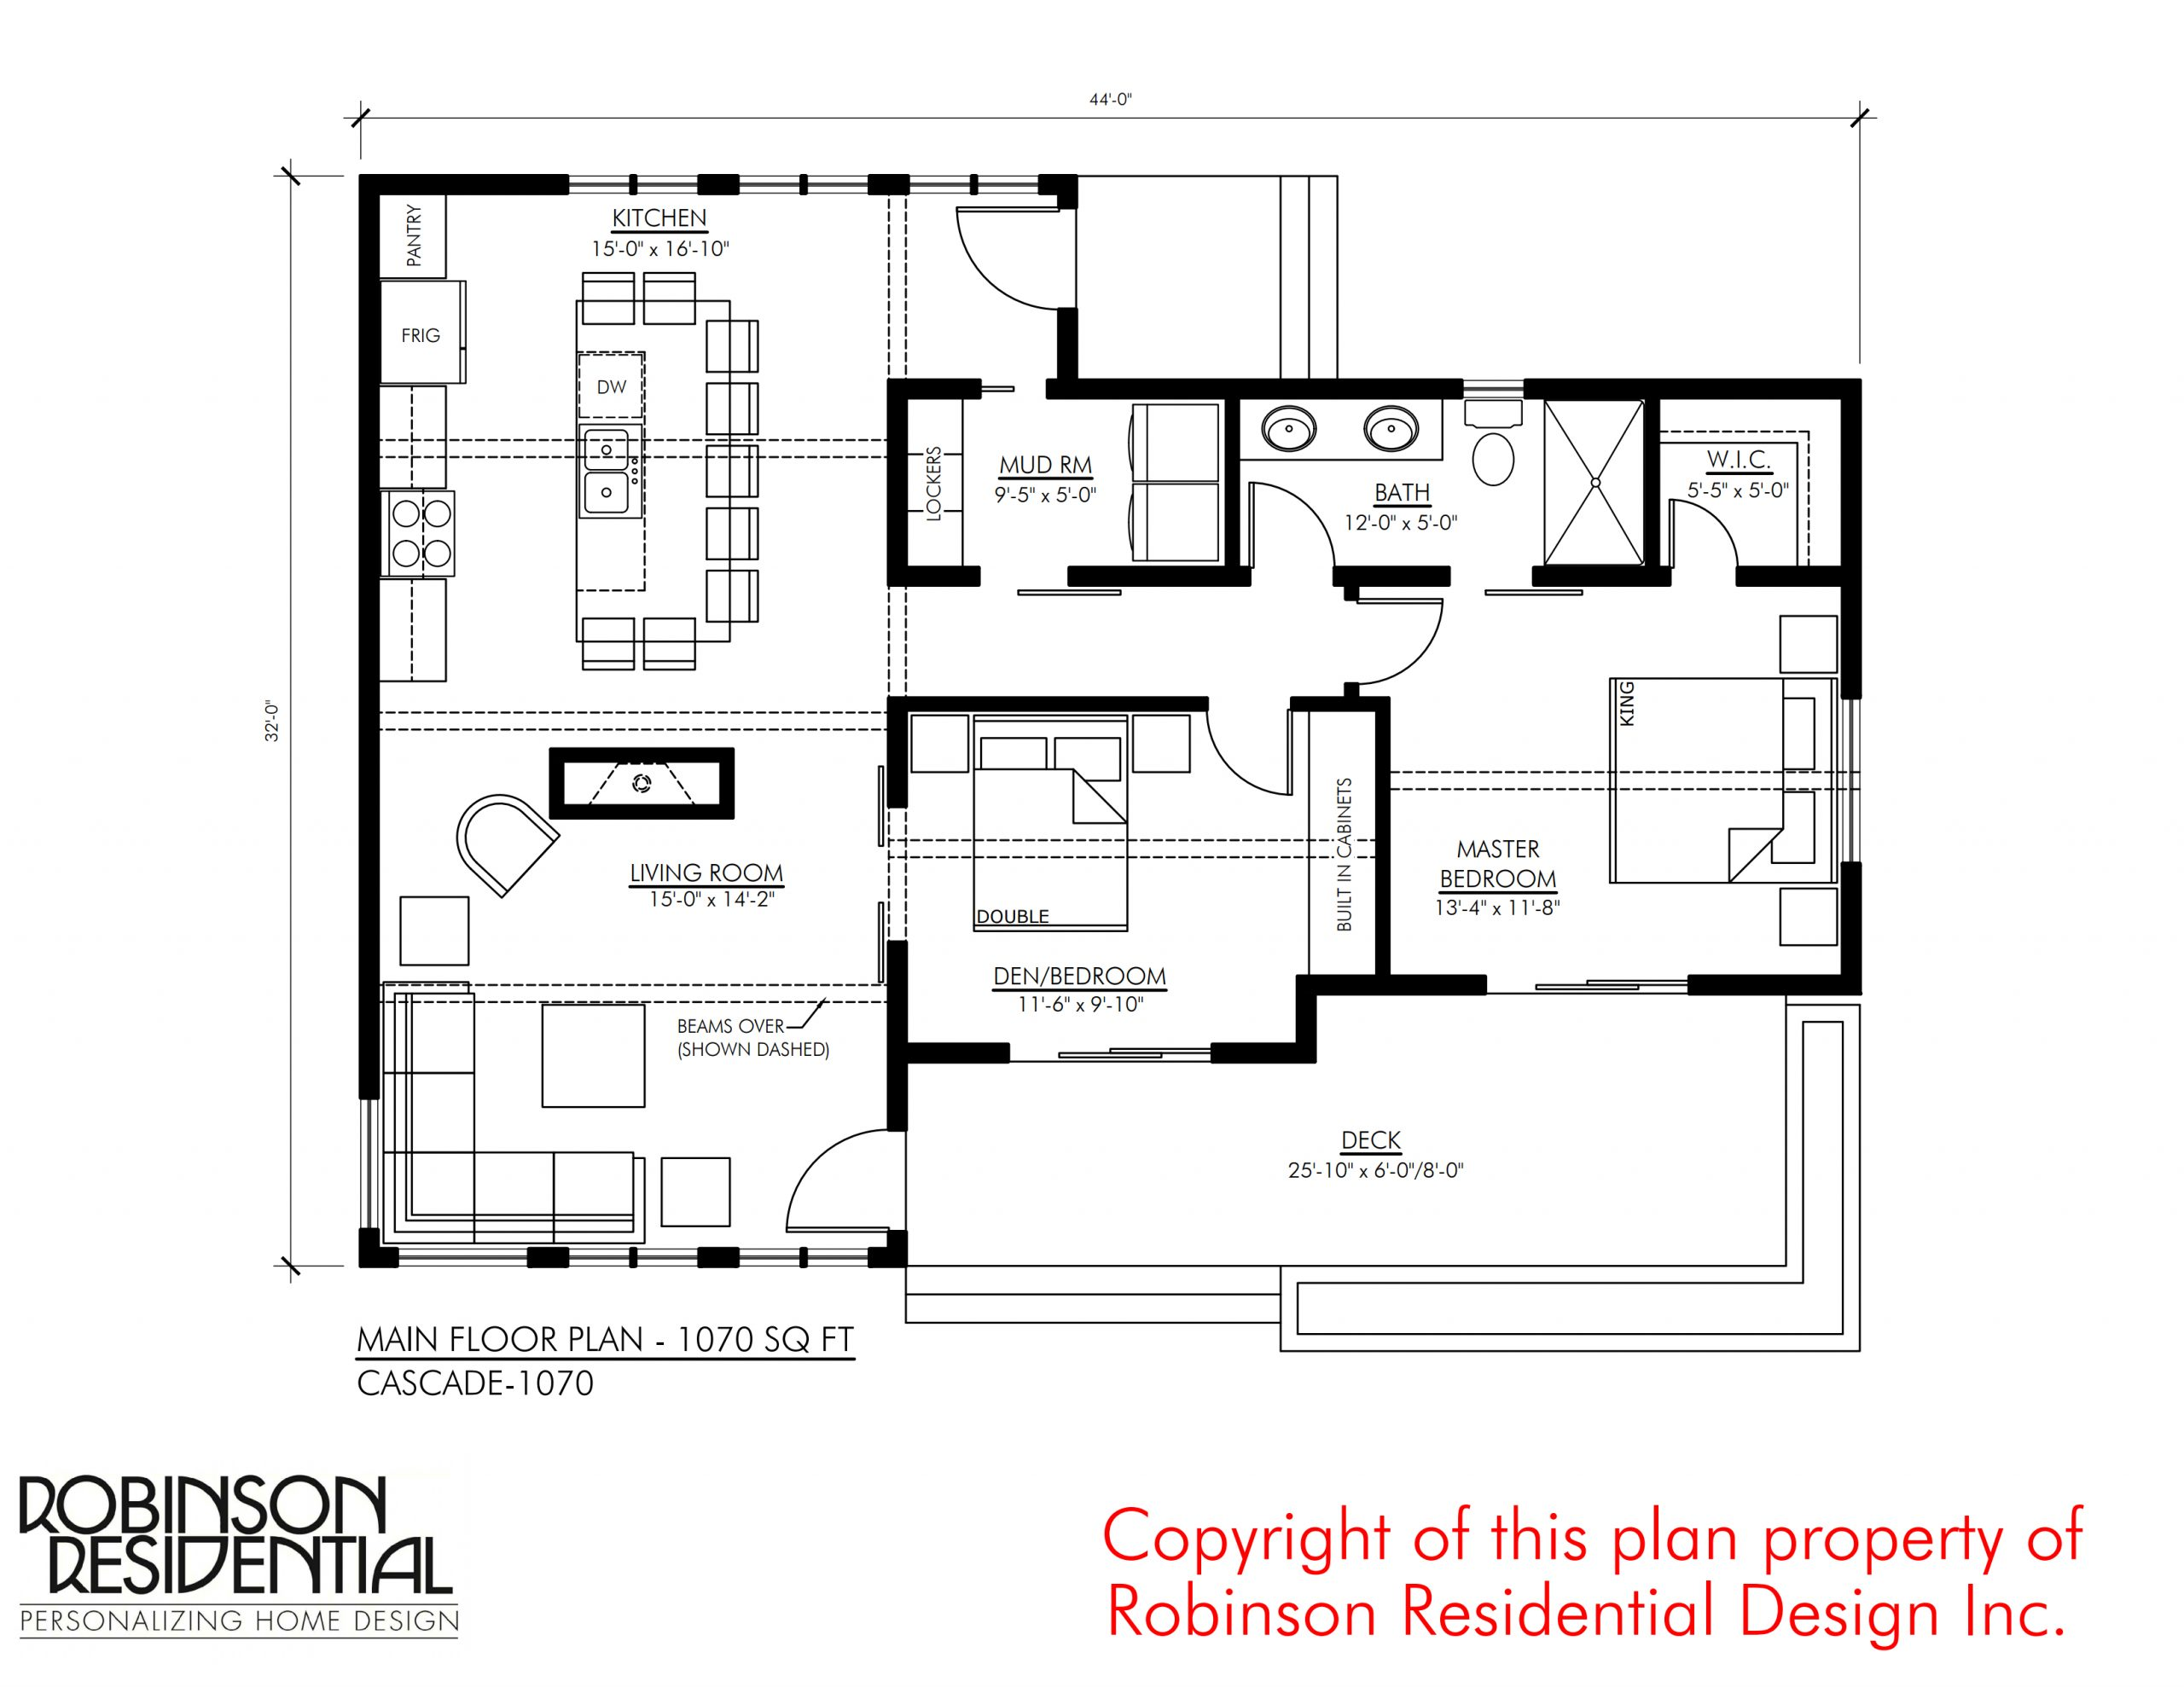 Contemporary Cascade 1070 Robinson Plans